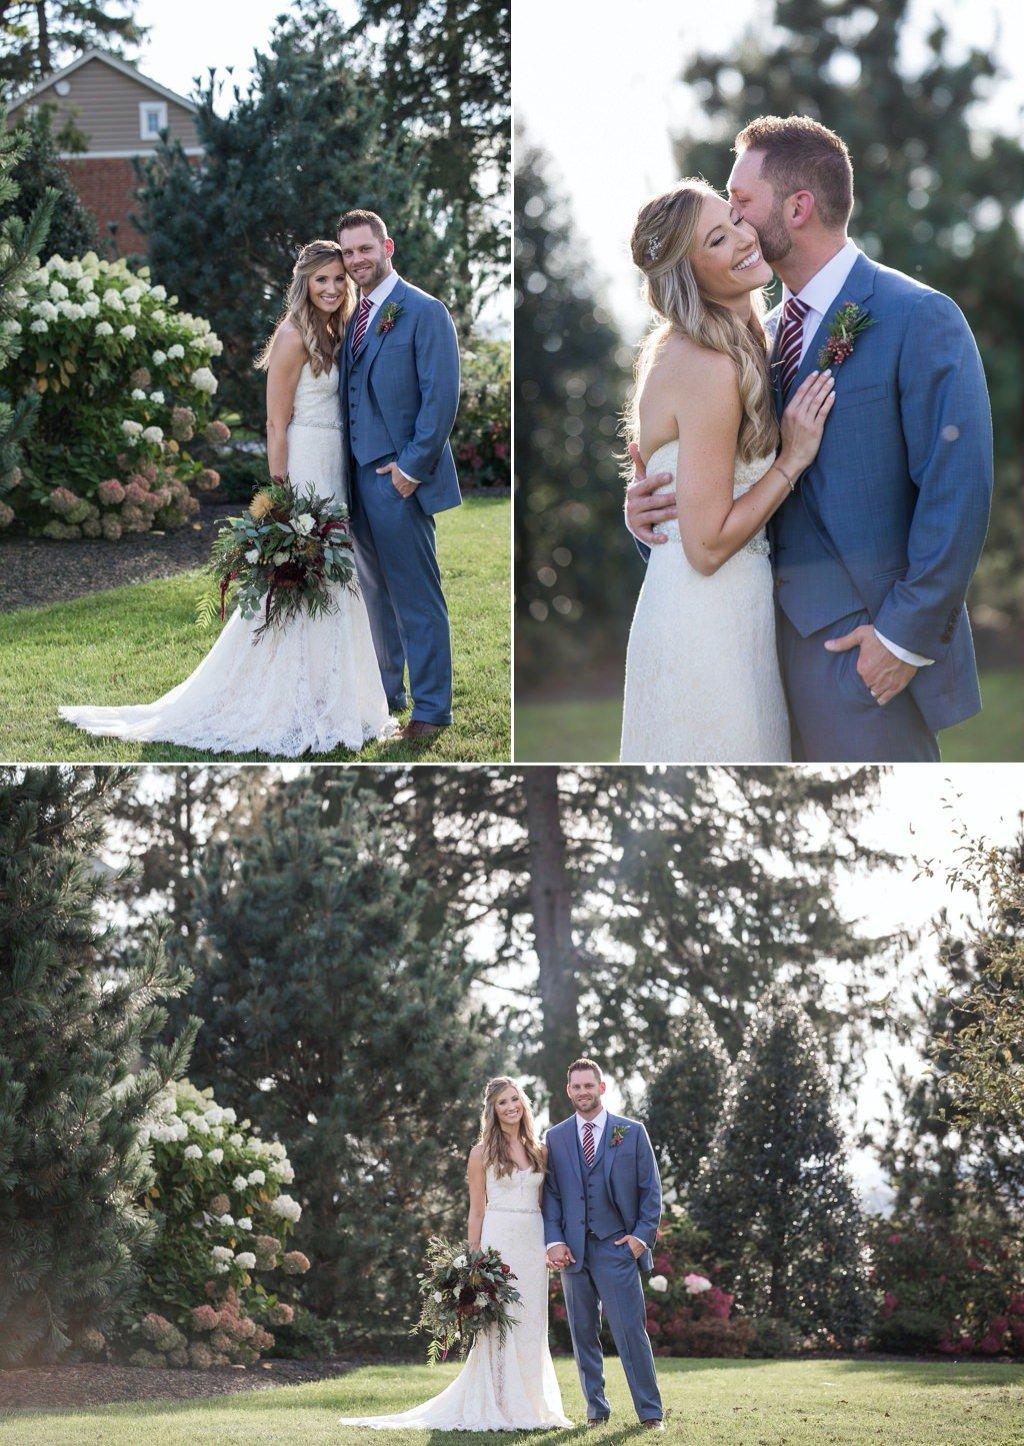 A bride and groom posing for photos at their Wyndridge Farm wedding in Dallastown, PA